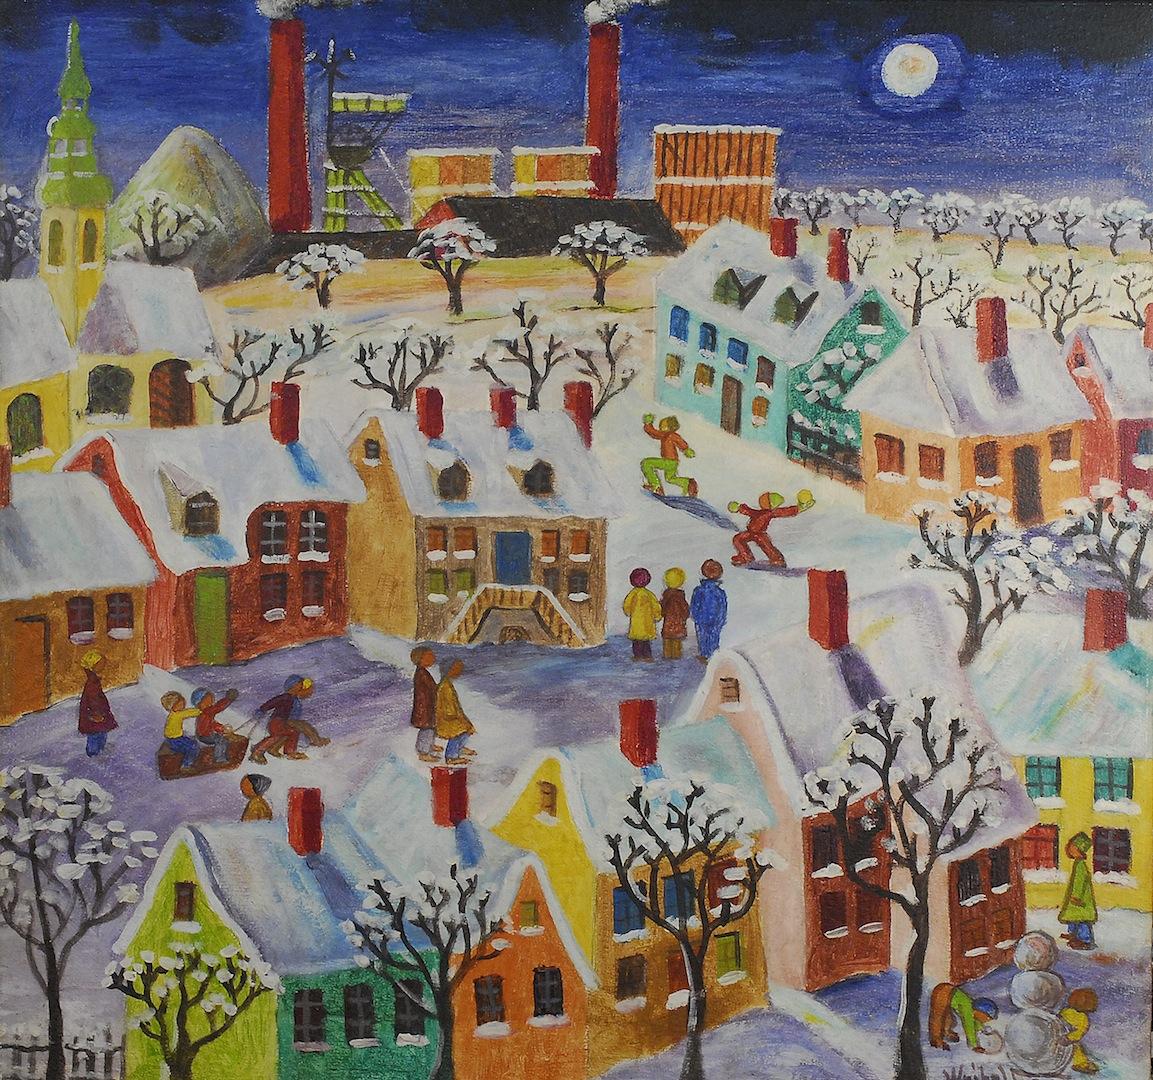 Zimowe zabawy, 1980